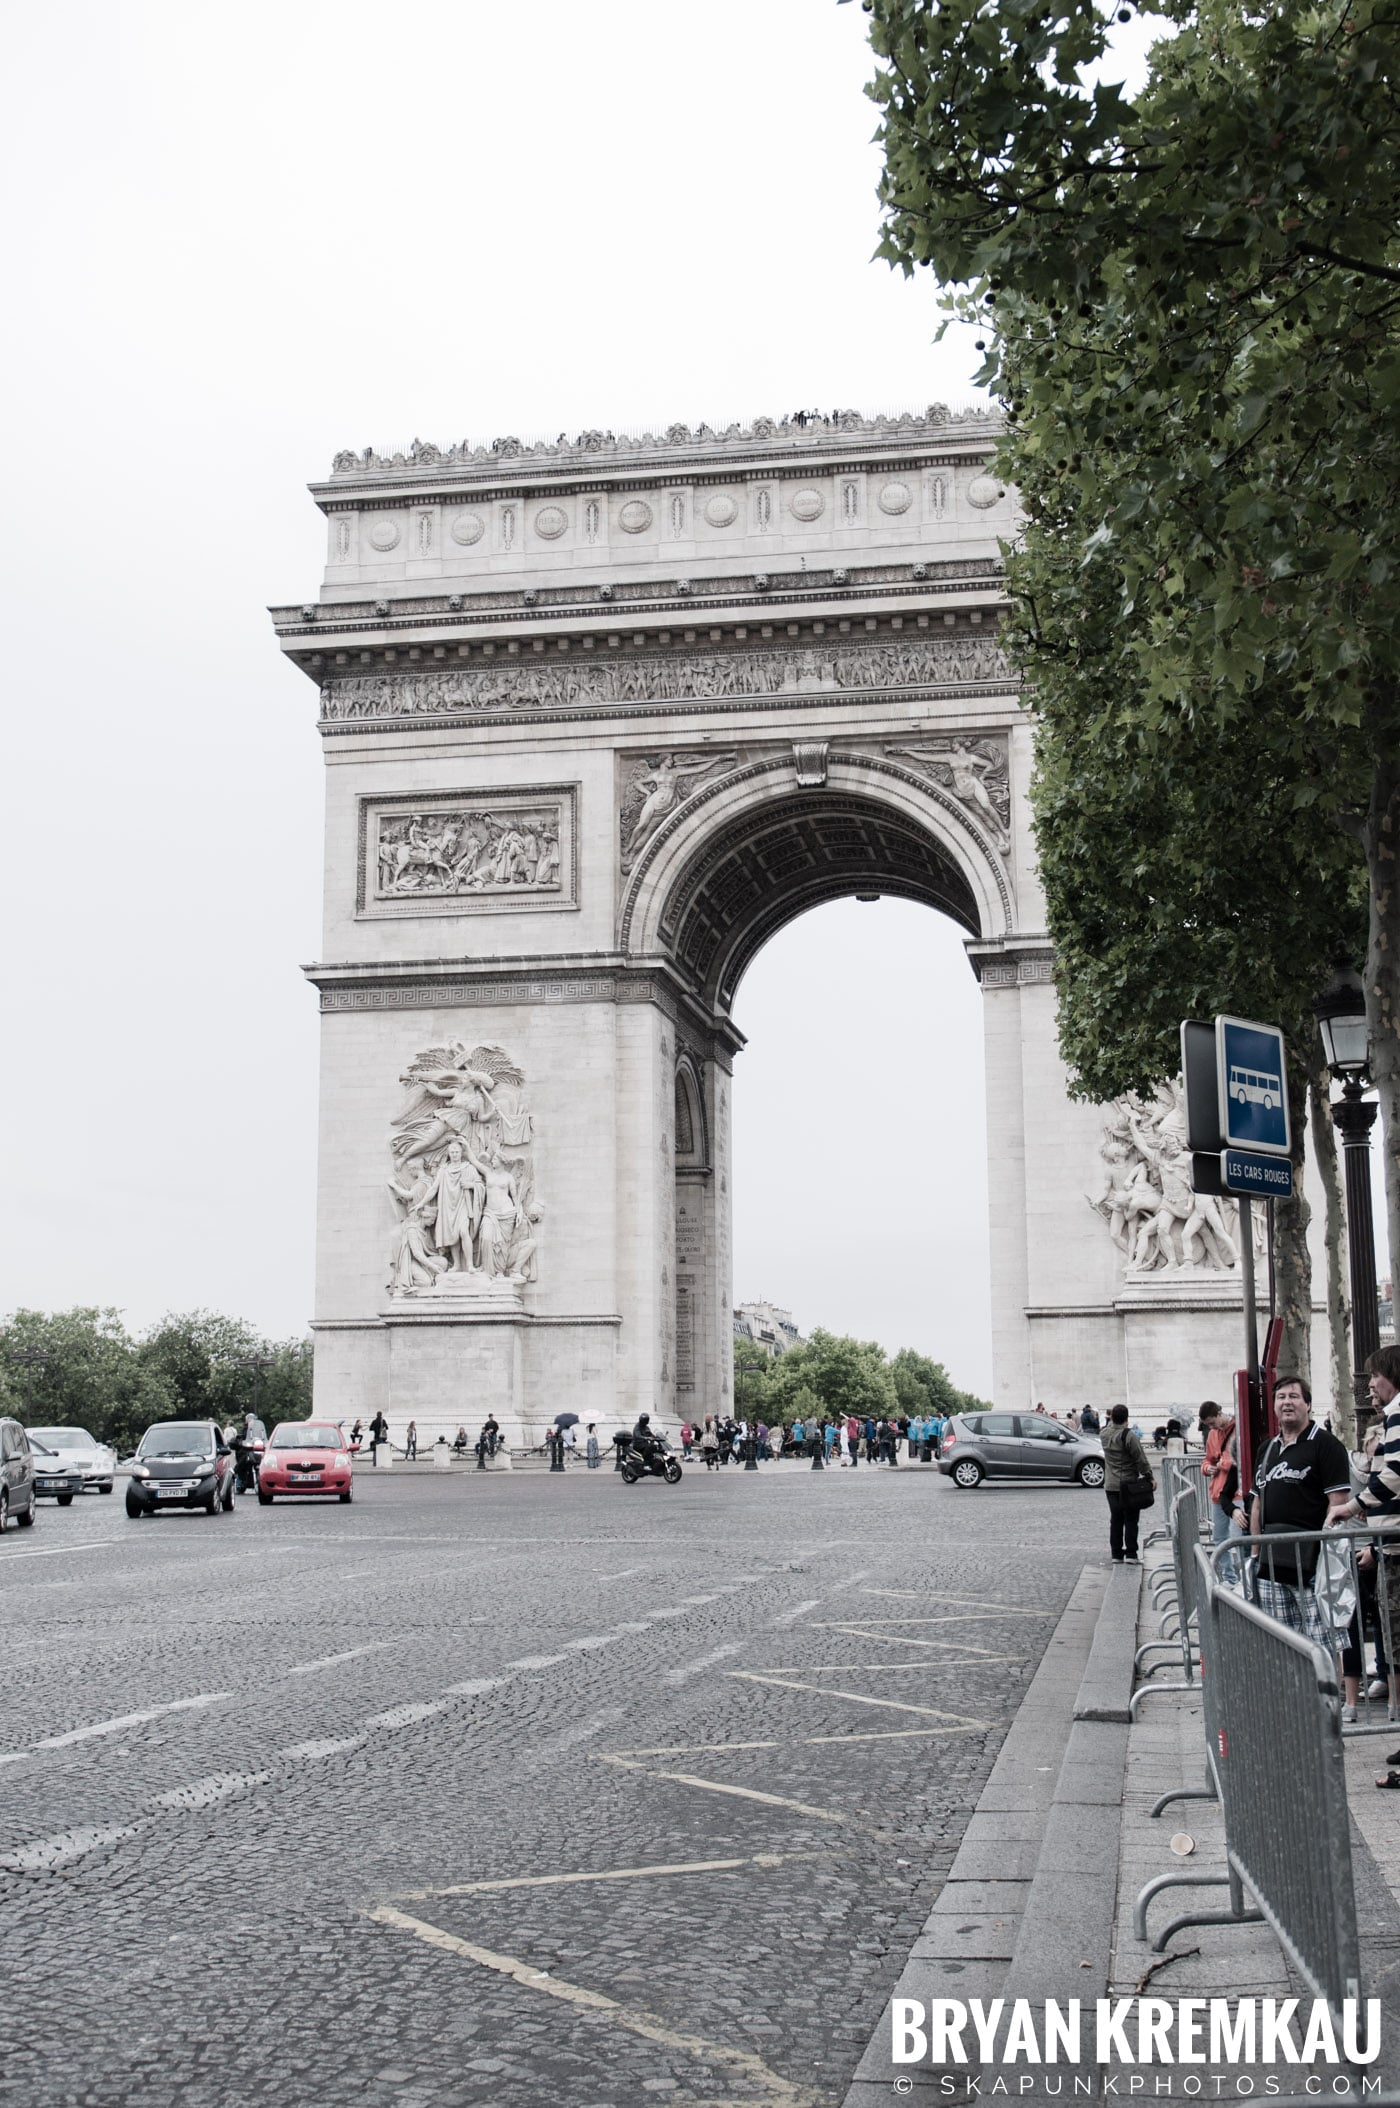 Paris, France Honeymoon - Day 3 - 7.20.11 (35)